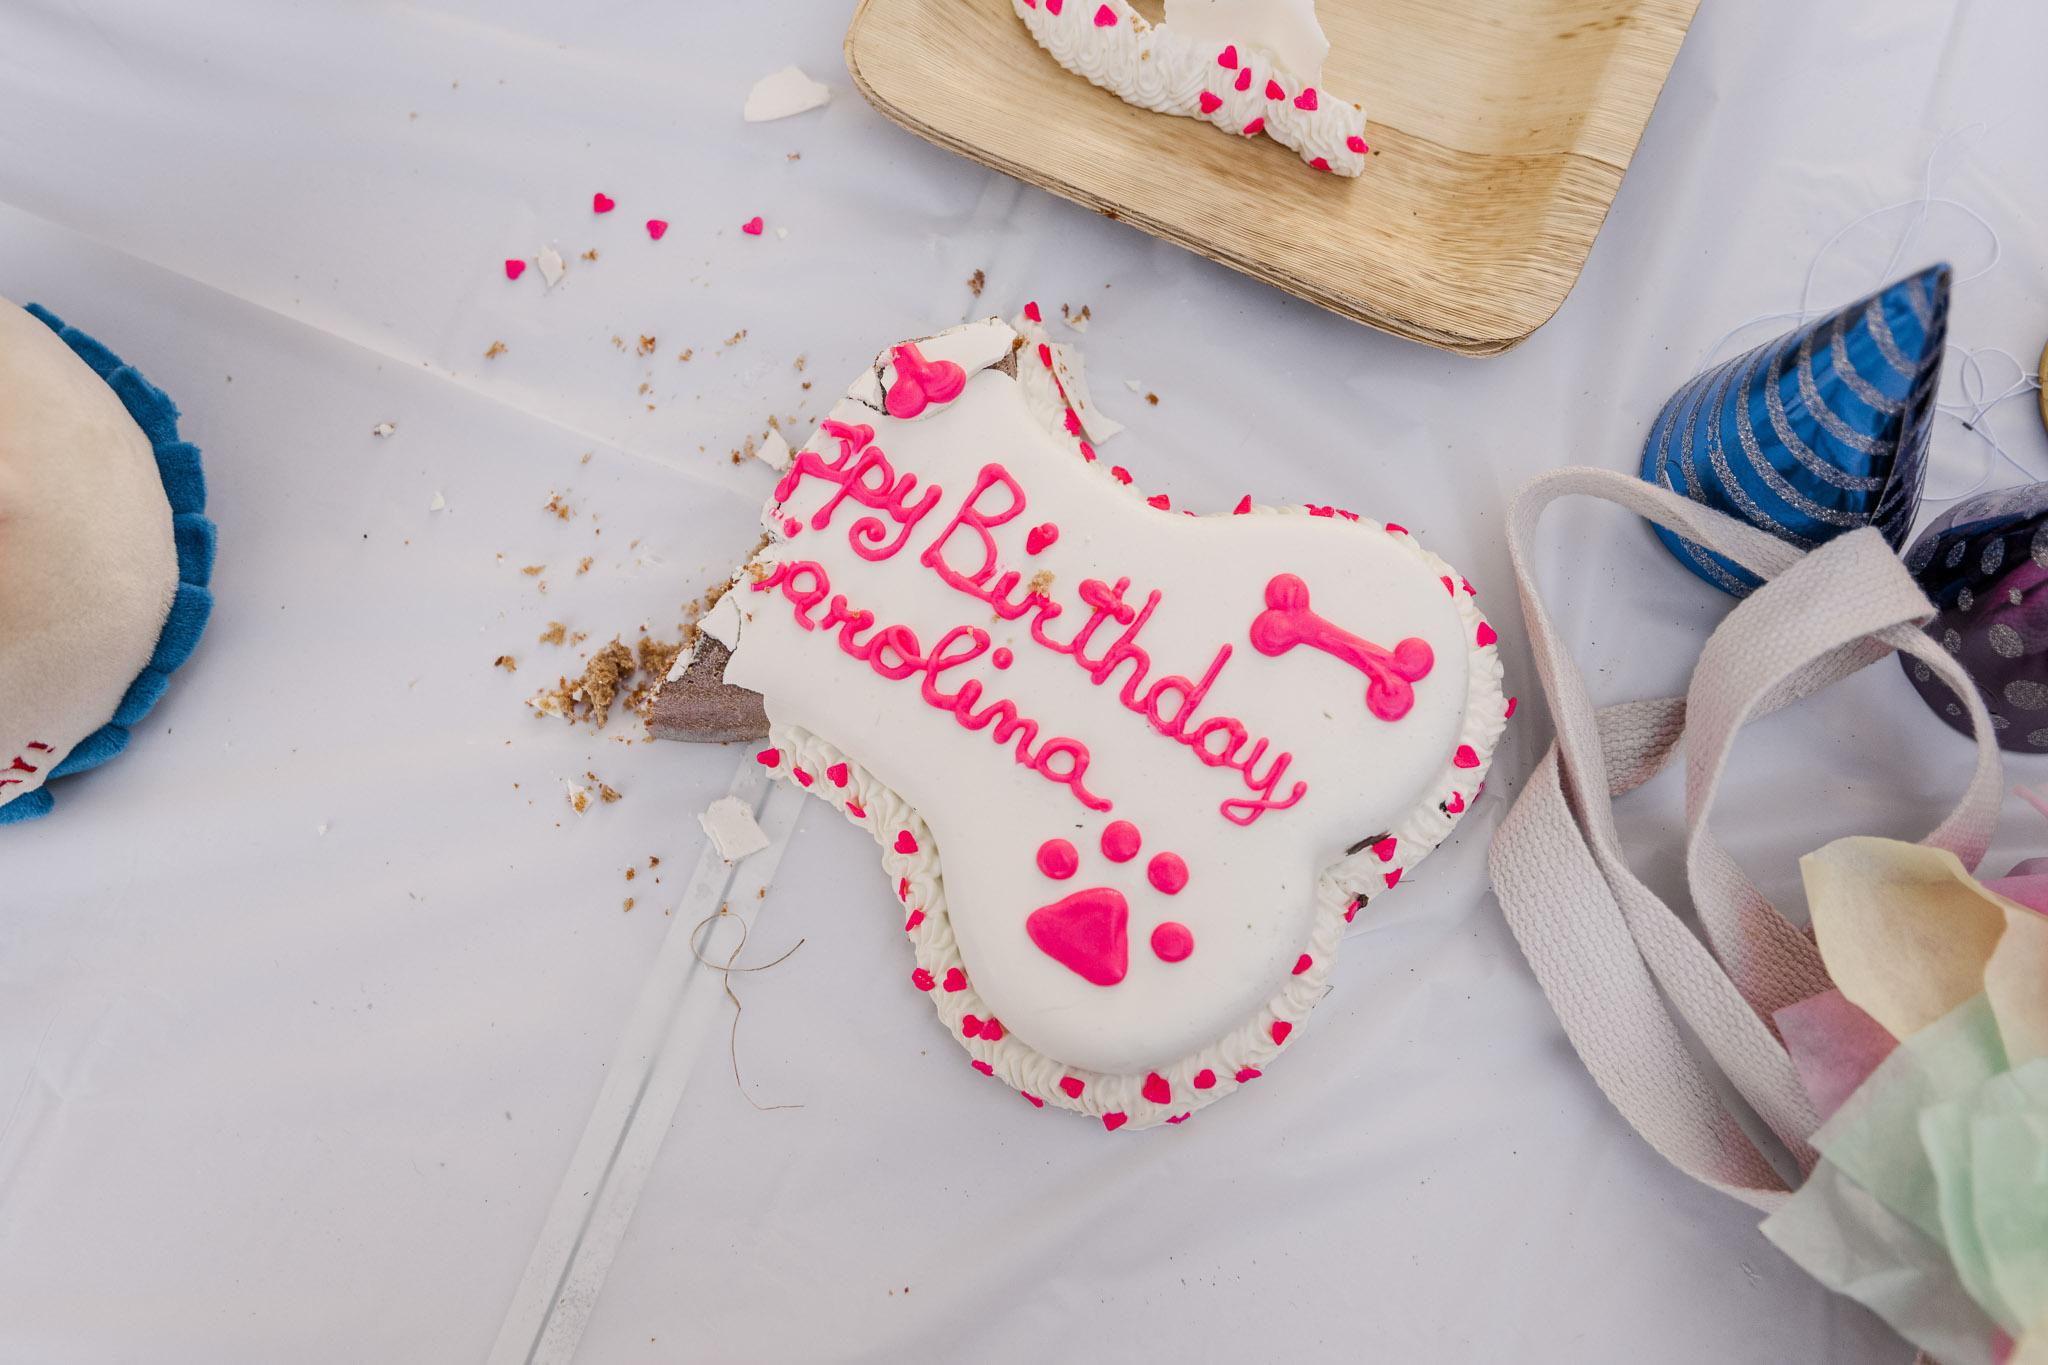 Happy birthday Carolina - a rescue puppy celebrated her gotcha day.